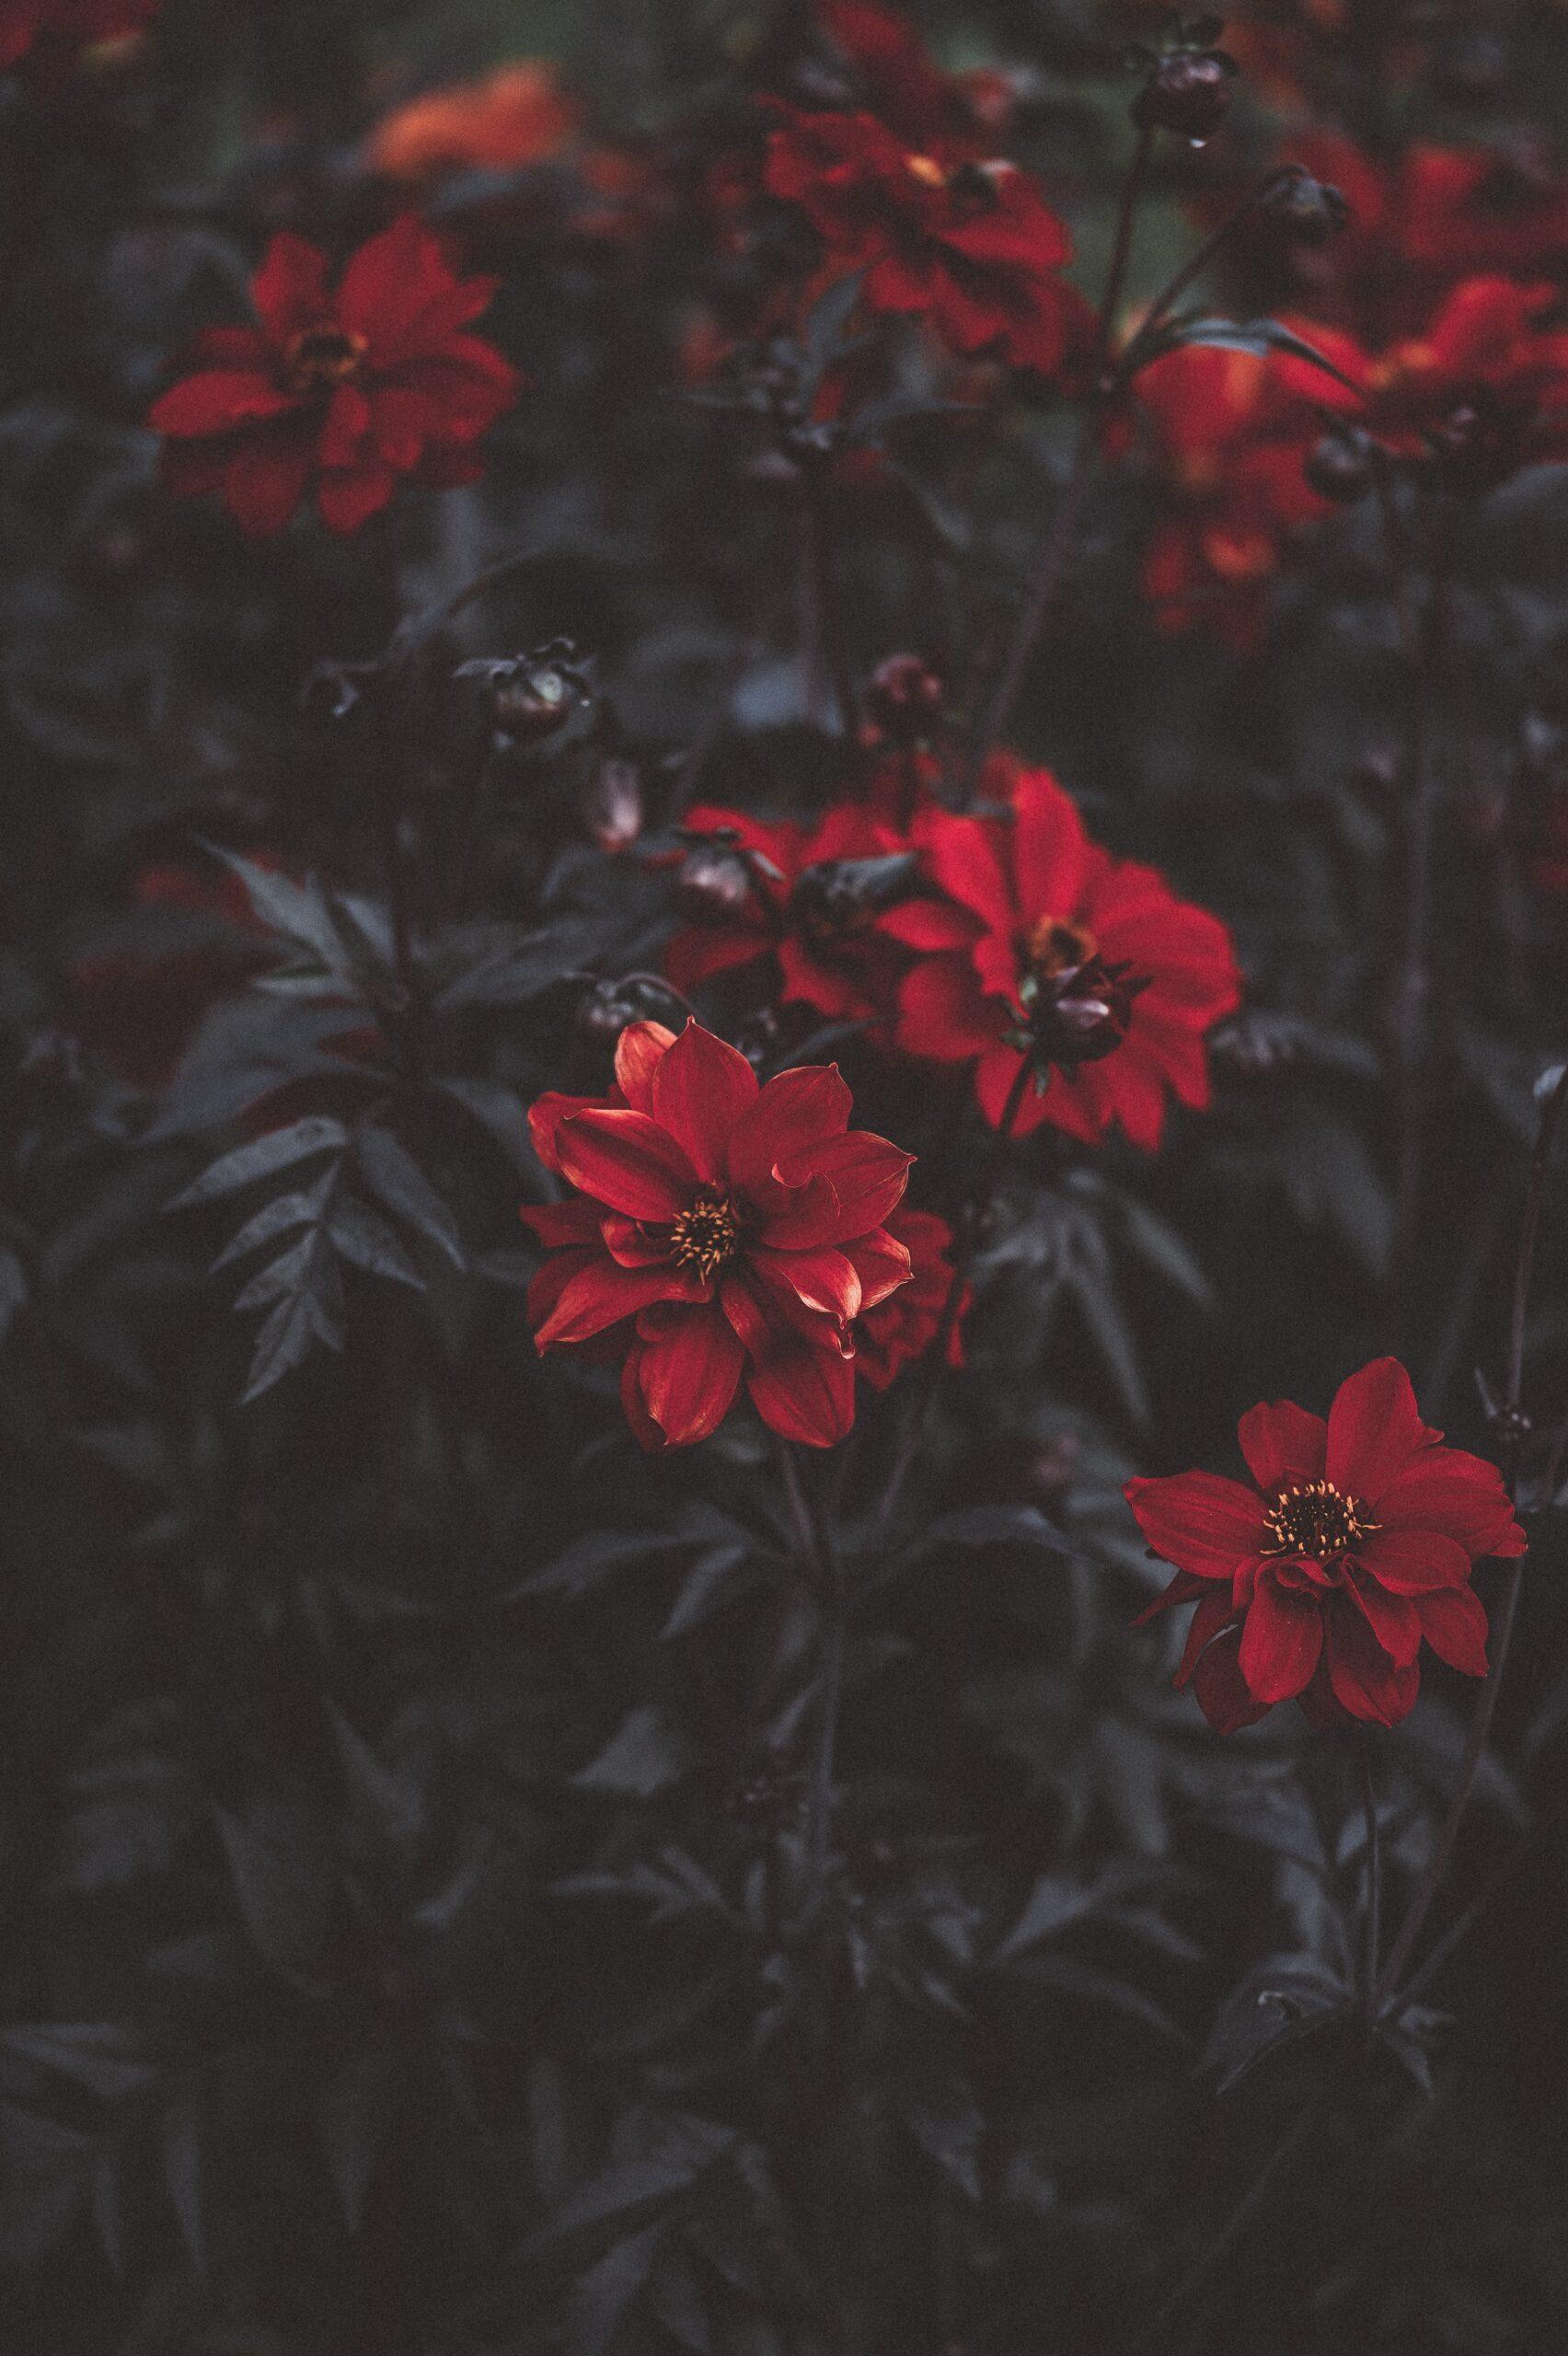 wallpaper Macro shot photography of red rose